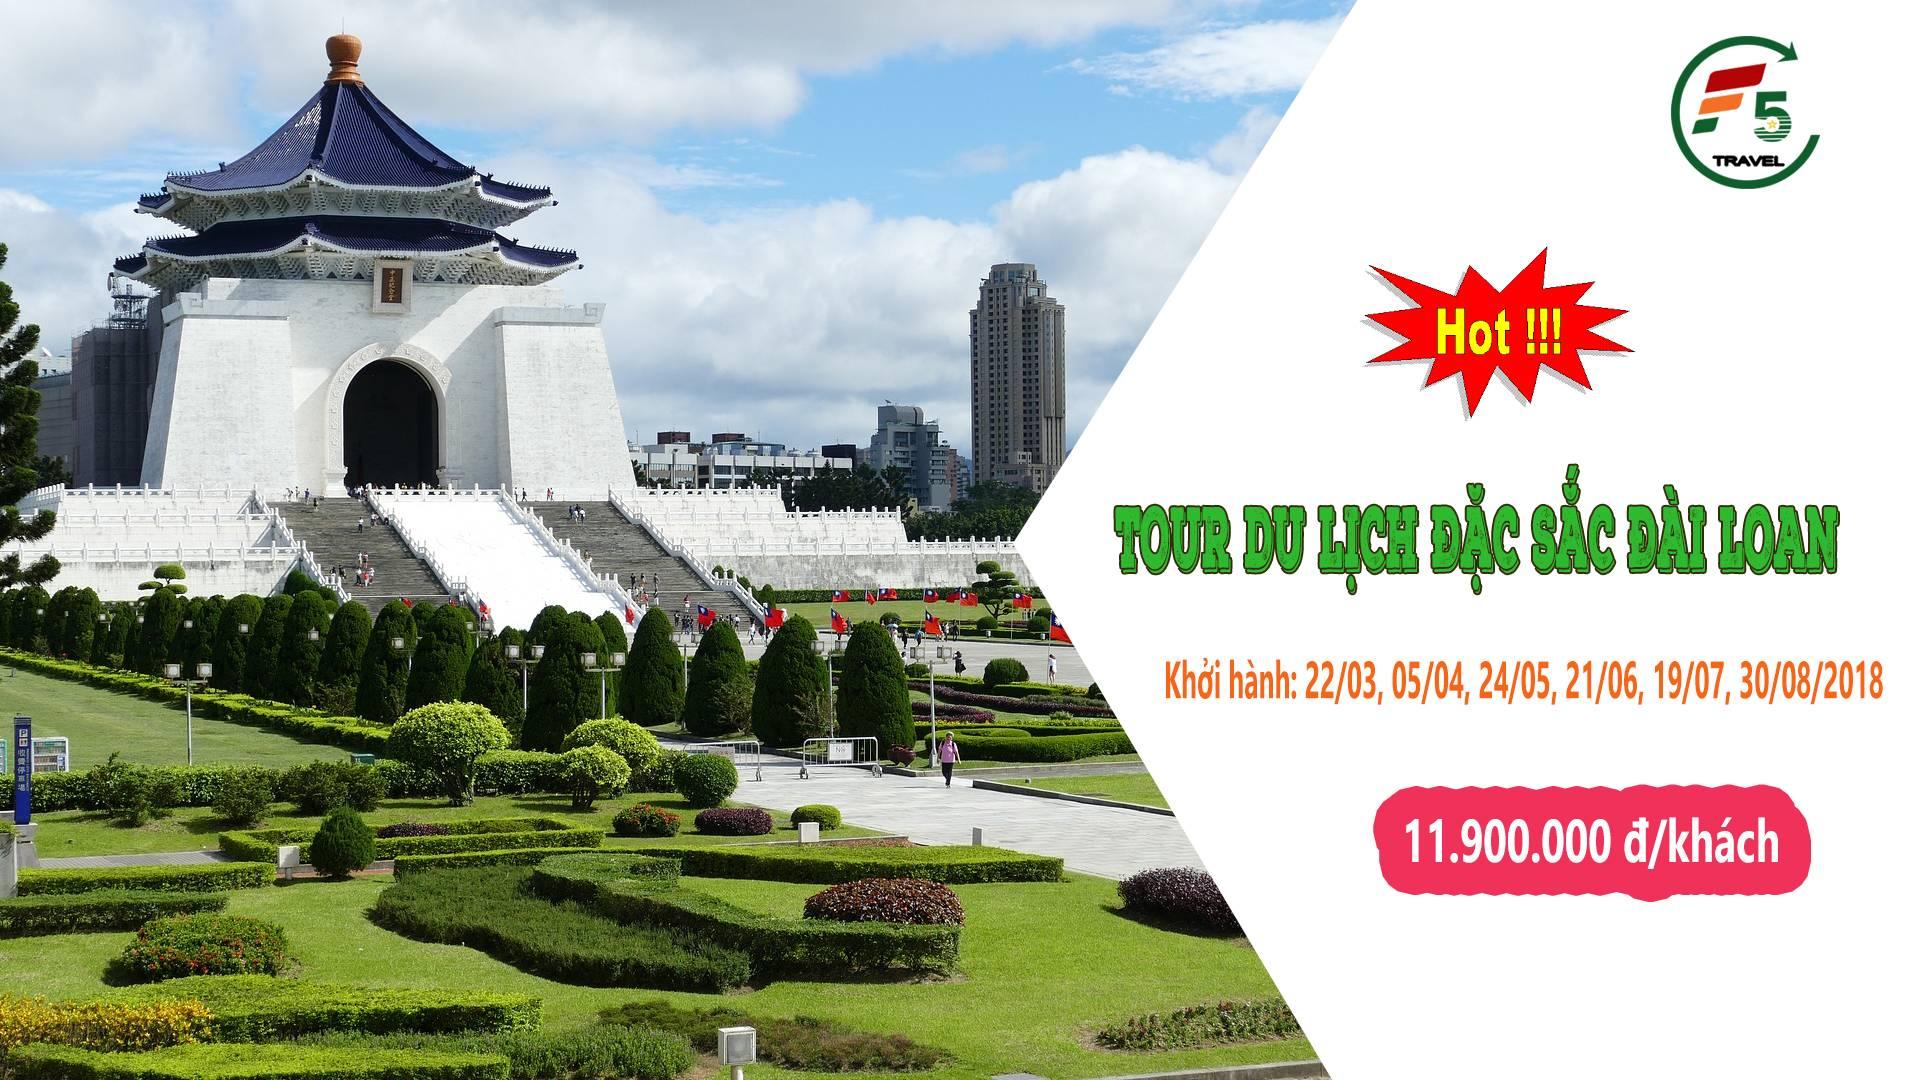 Taiwan seri 2018 1920x1080 - TRANG CHỦ